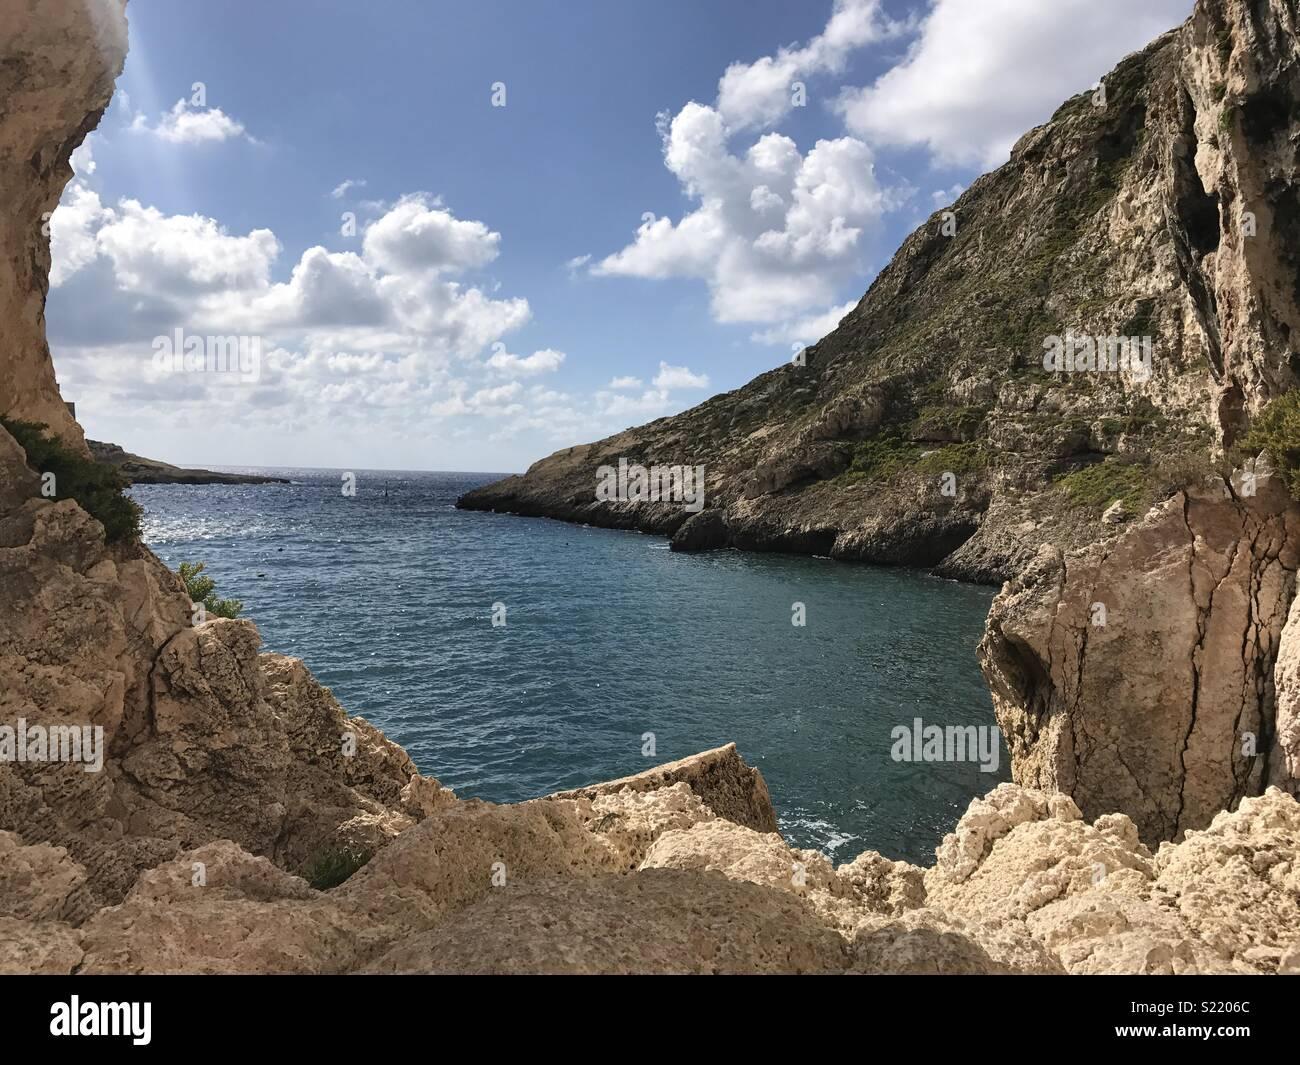 Malta, Gozo sea view - Stock Image